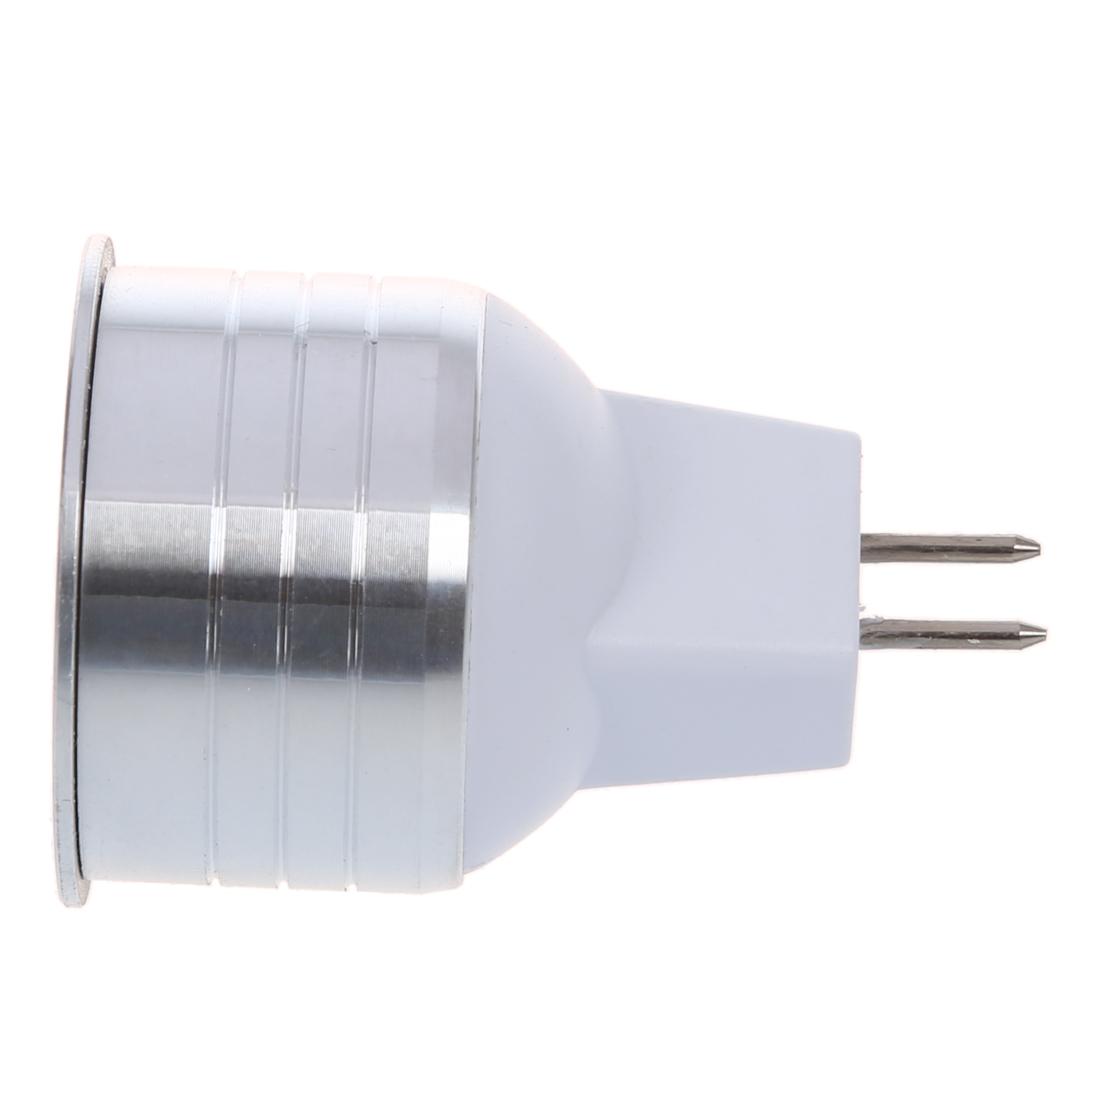 mr11 gu4 3w high power led spotlight bulb light warm white 12v p4l1 ebay. Black Bedroom Furniture Sets. Home Design Ideas